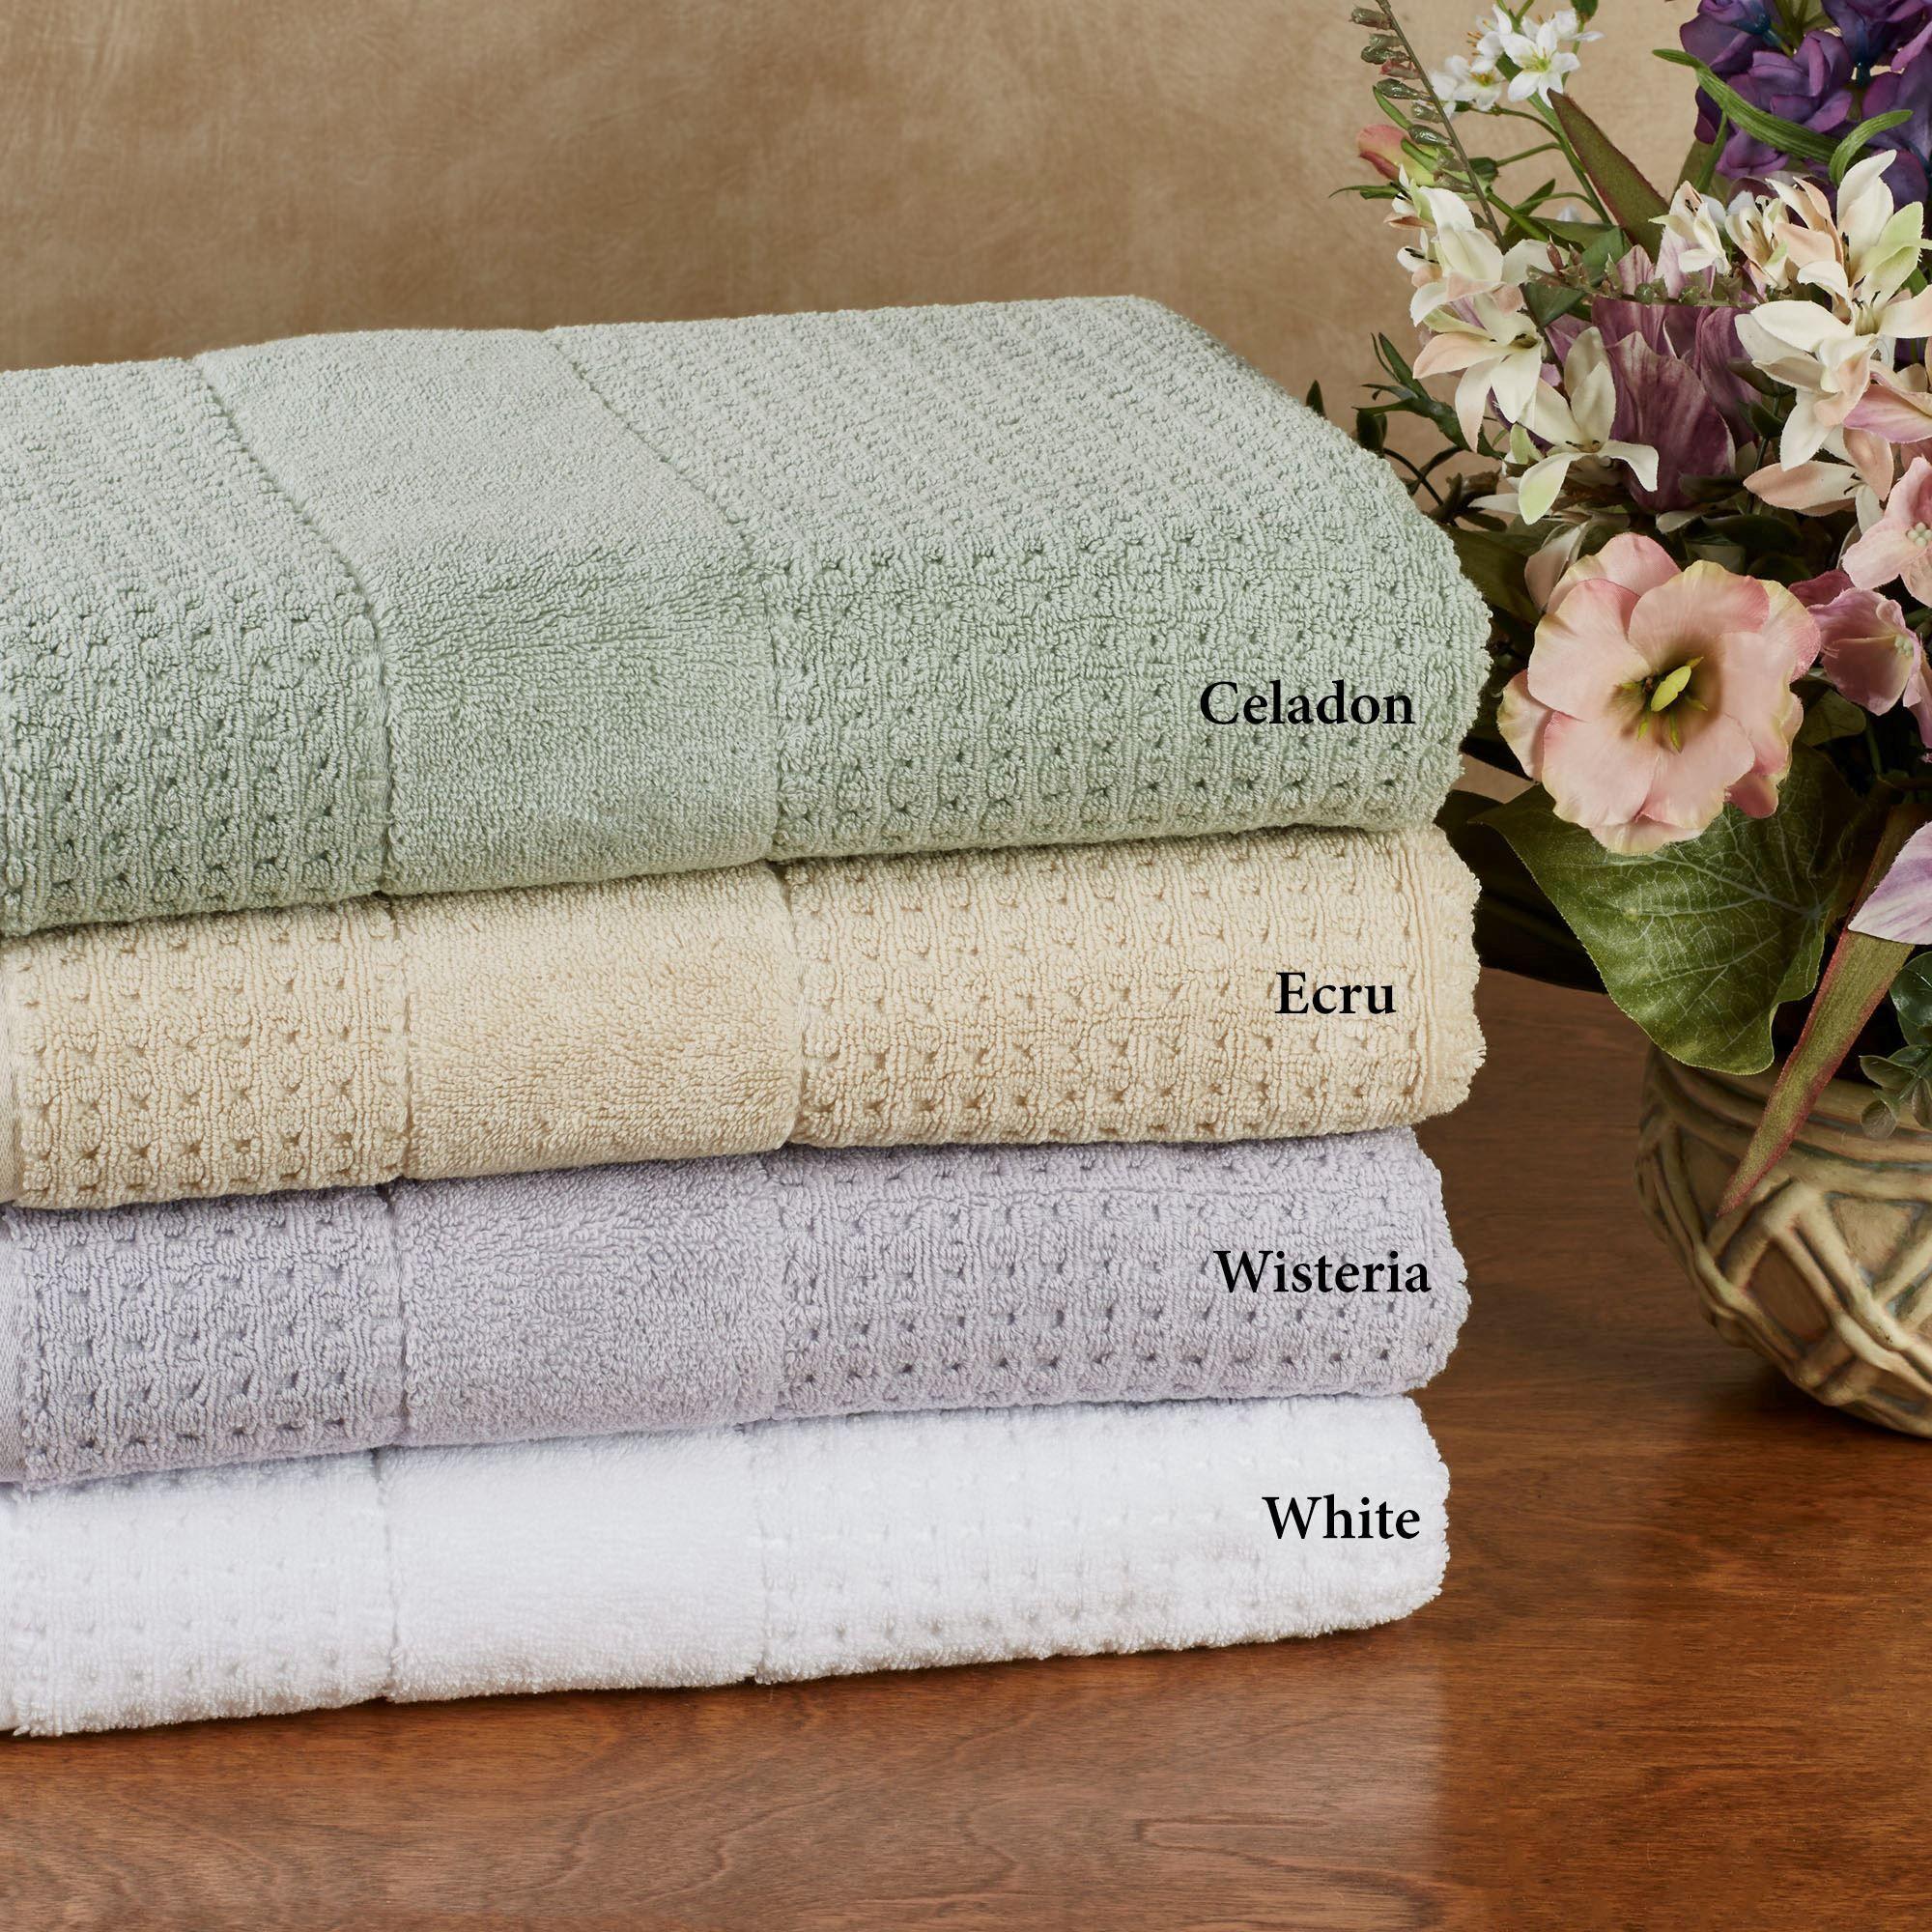 650 Gsm Hammam Waffle Weave Turkish Cotton Bath Towels